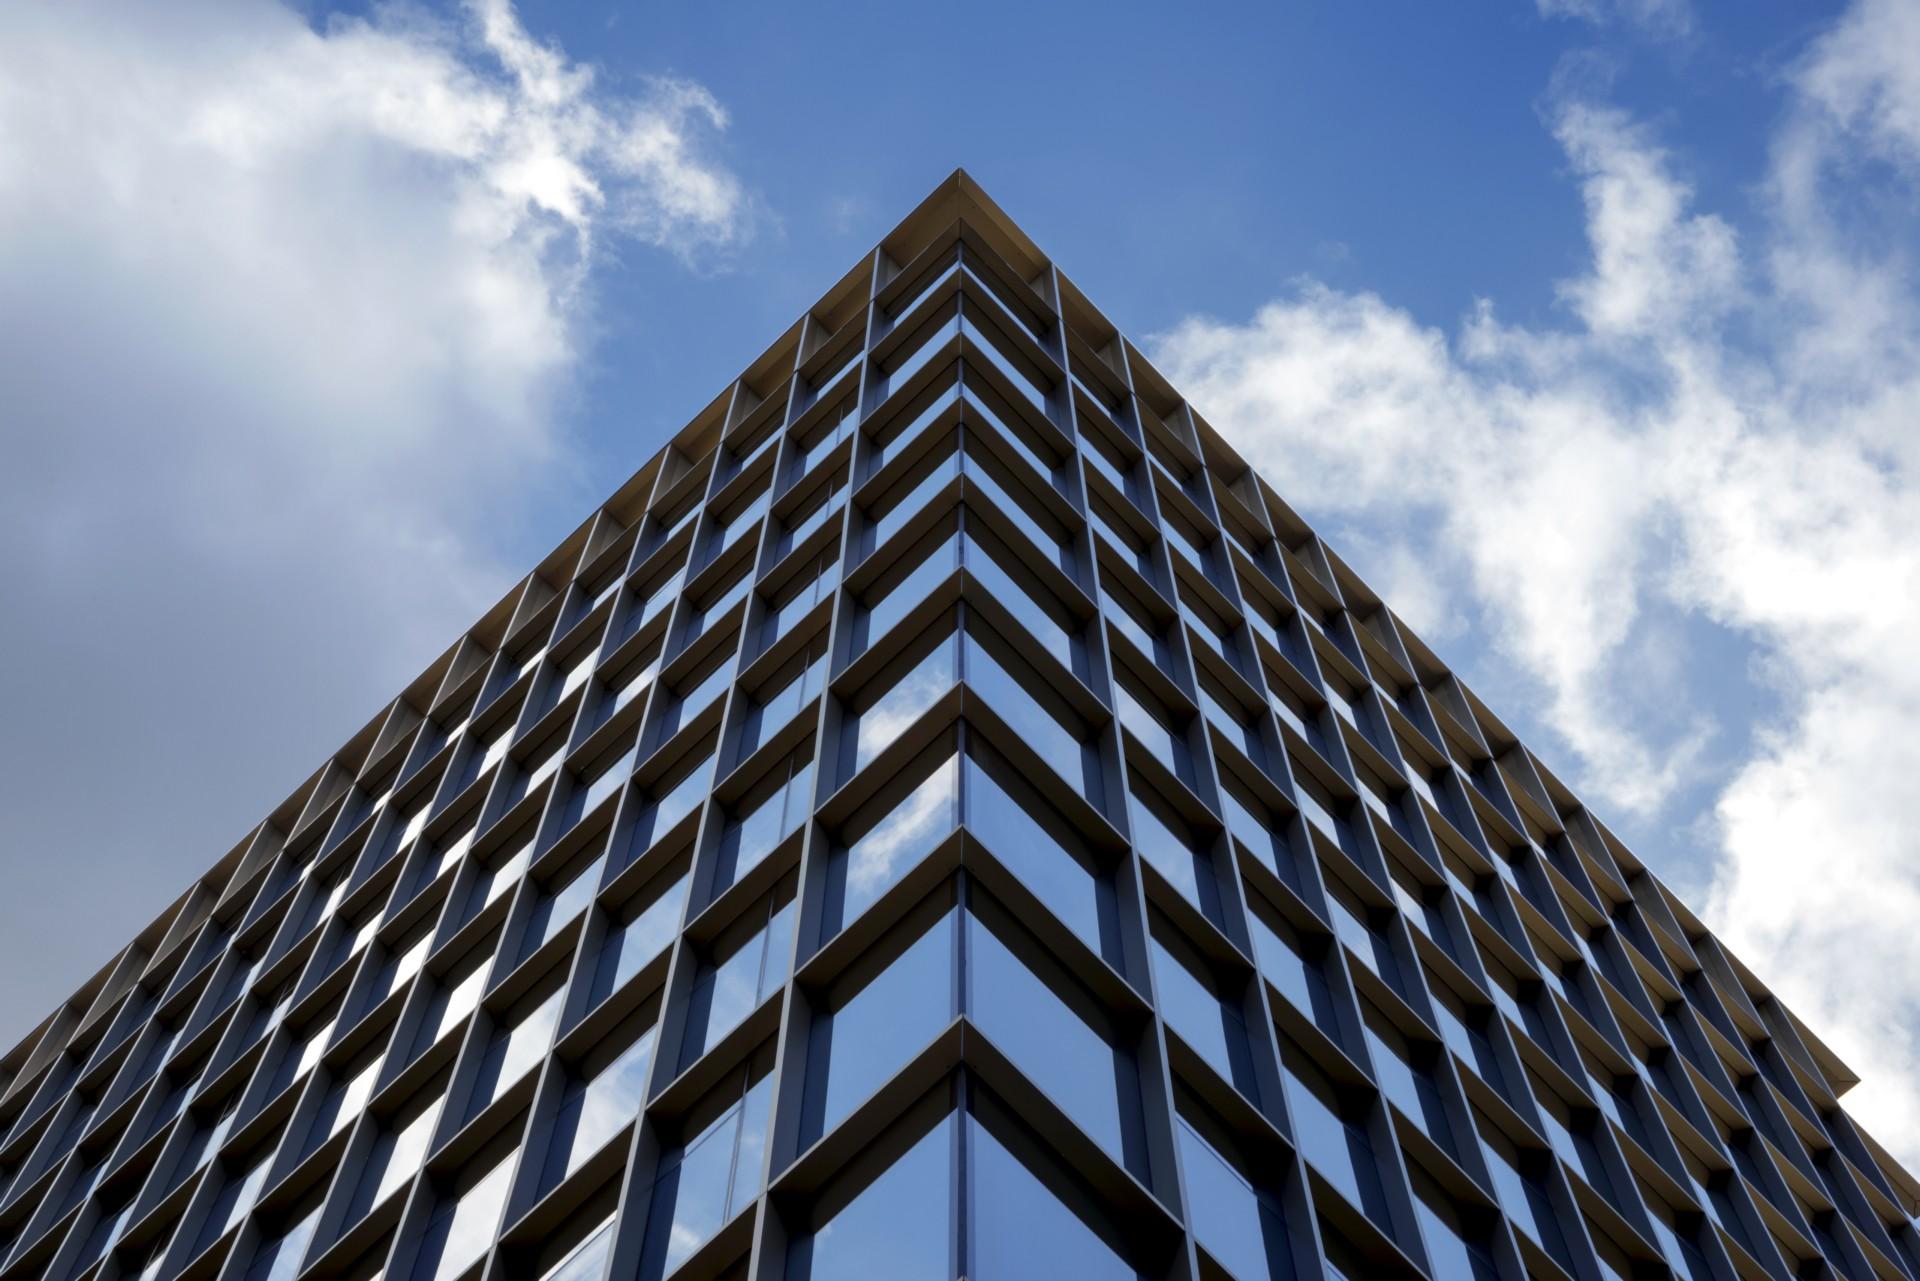 Lombardini22 L22 Urban & Building S32 Fintech District Torre Sassetti Milán